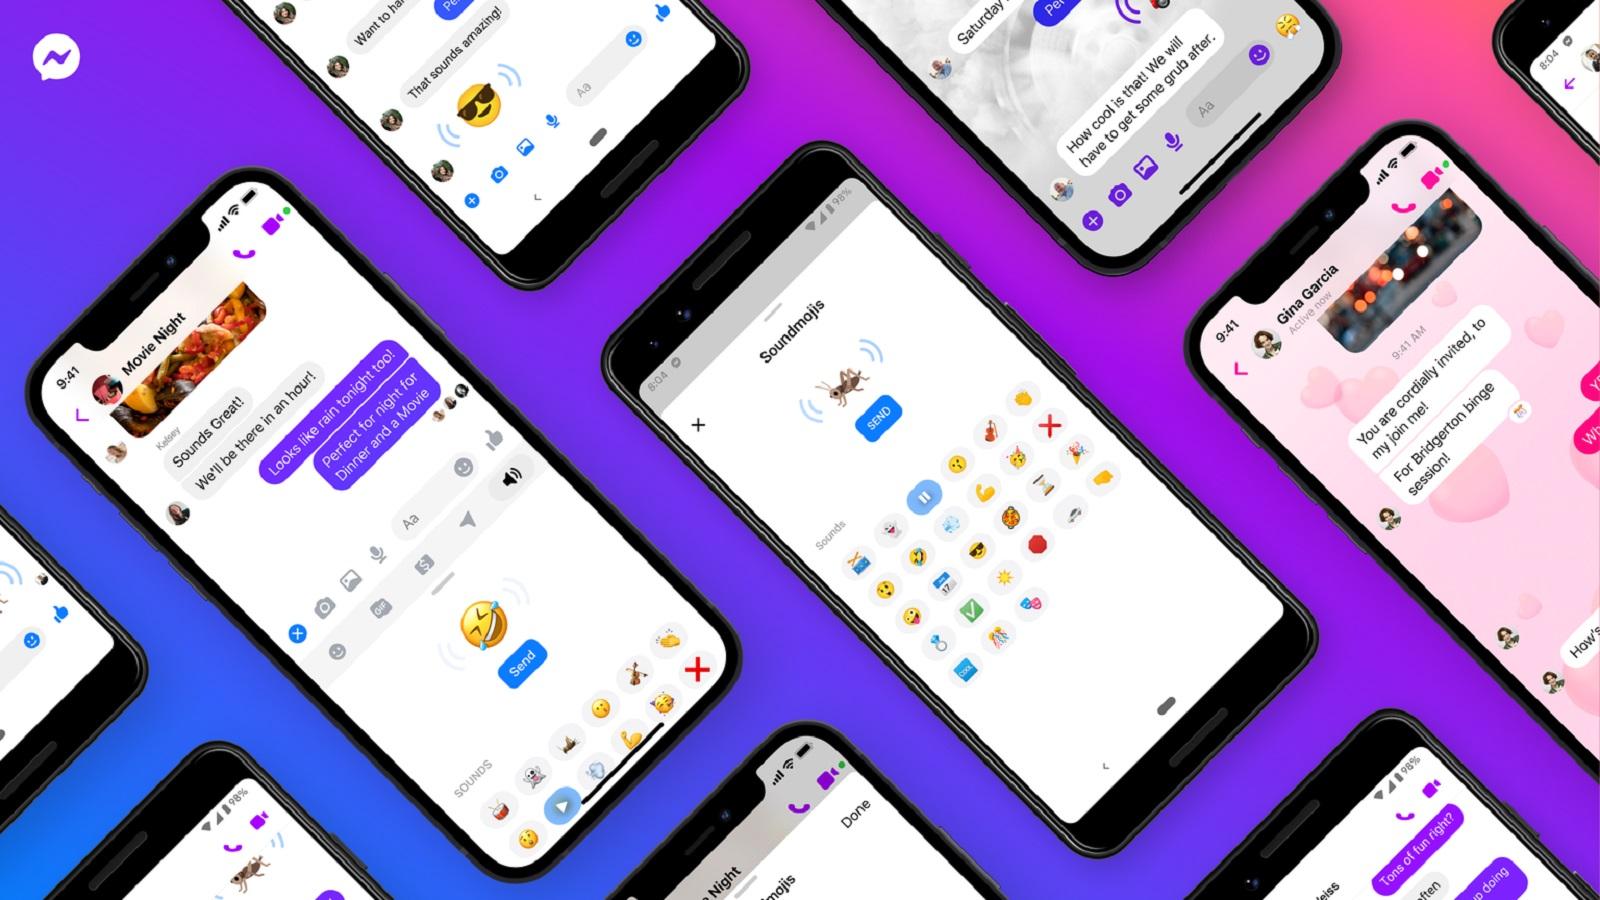 Facebook launches Soundmojis (emojis with sound) - Memeburn